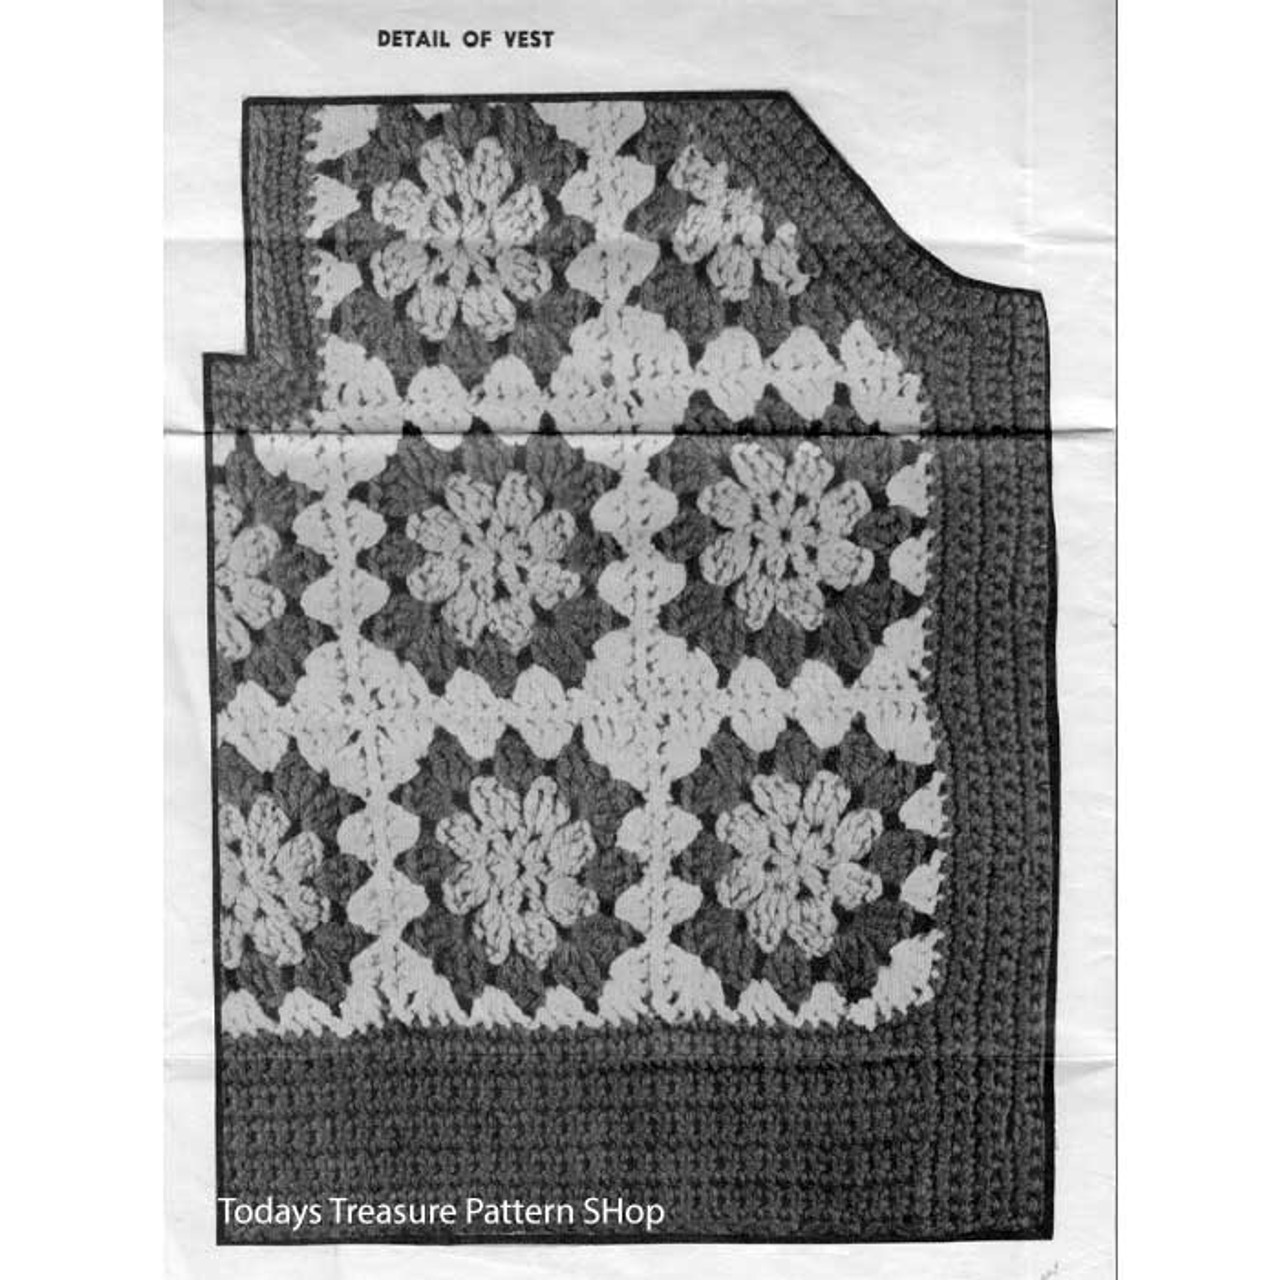 Crochet Vest of Square Blocks Pattern